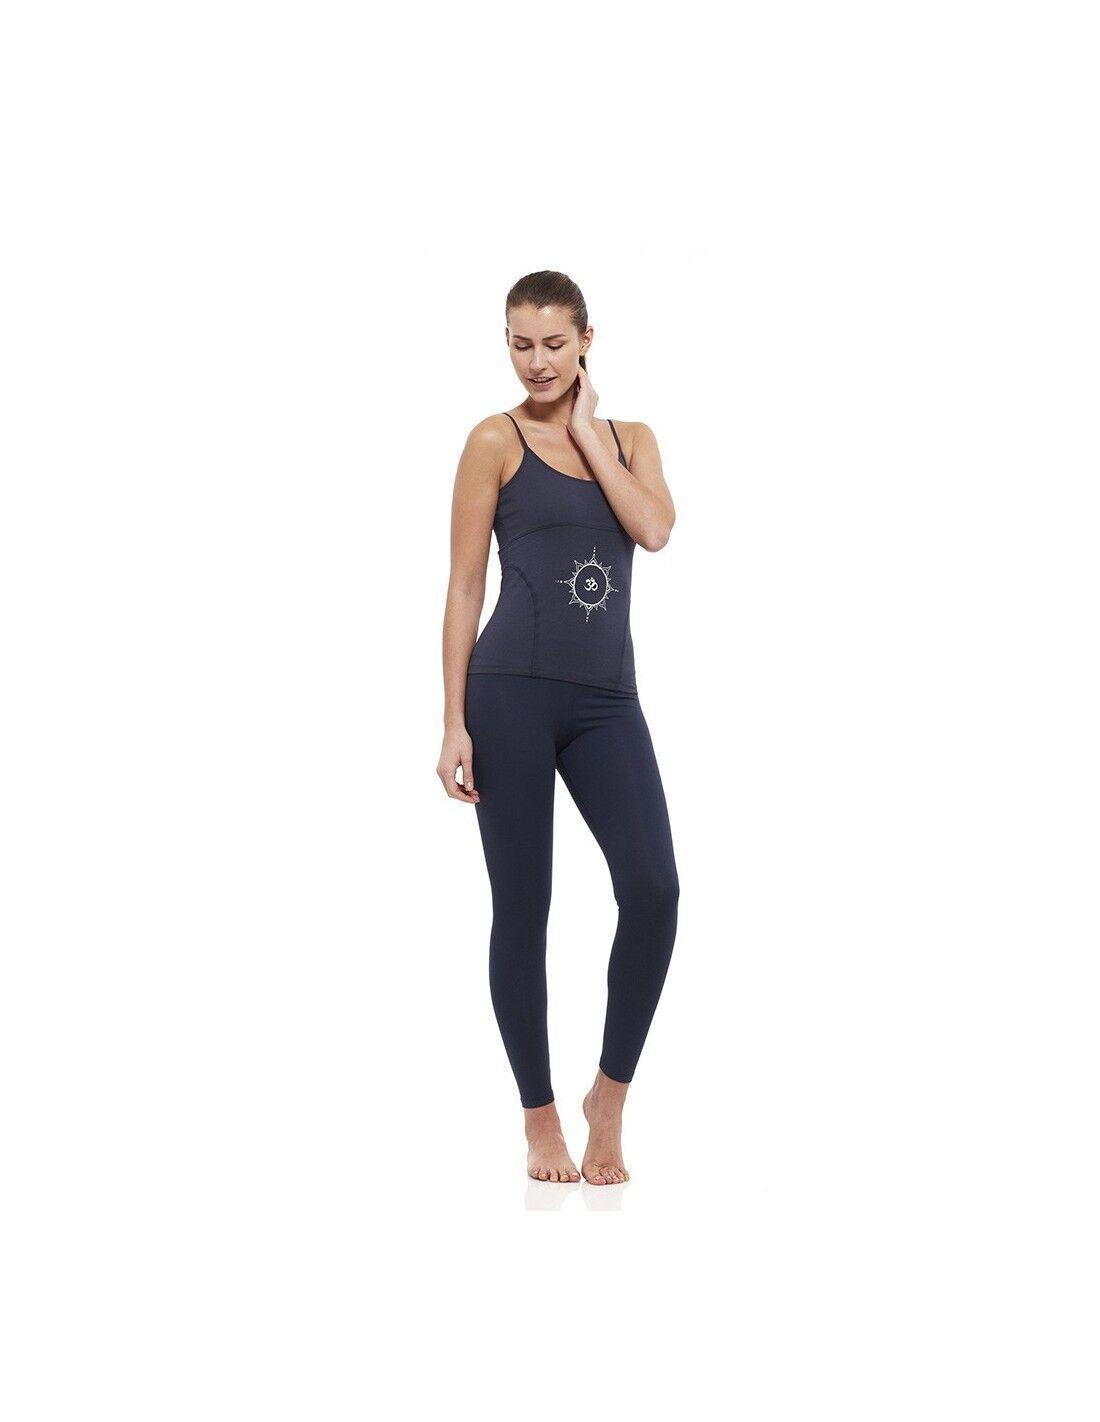 yogaessential completo: canotta yoga young + legging vita alta (blu)